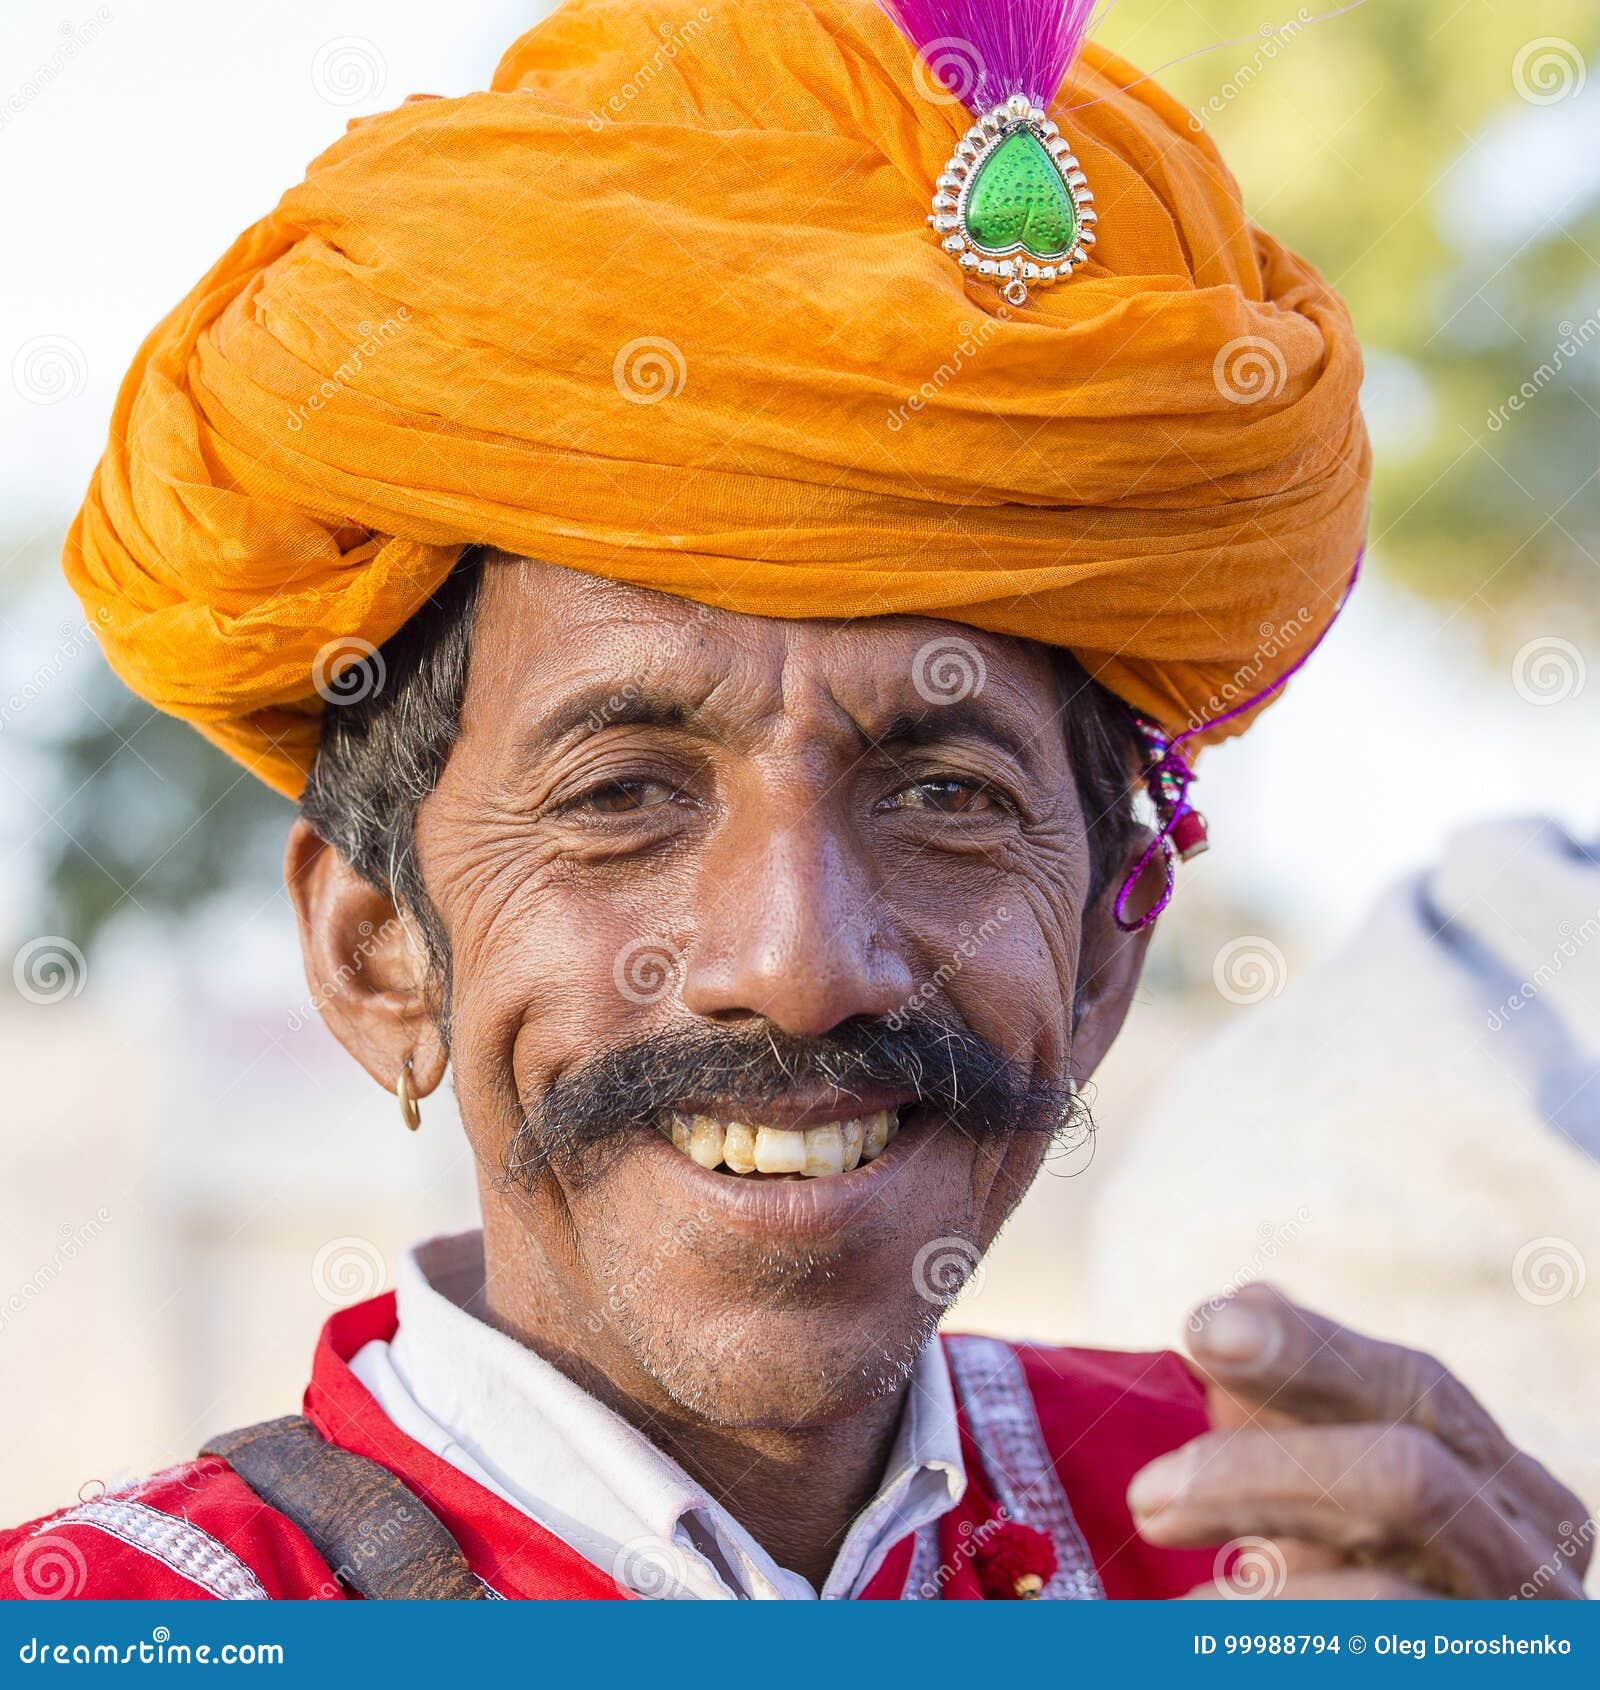 Portrait men wearing traditional Rajasthani dress participate in Mr. Desert contest as part of Desert Festival in Jaisalmer, Rajas